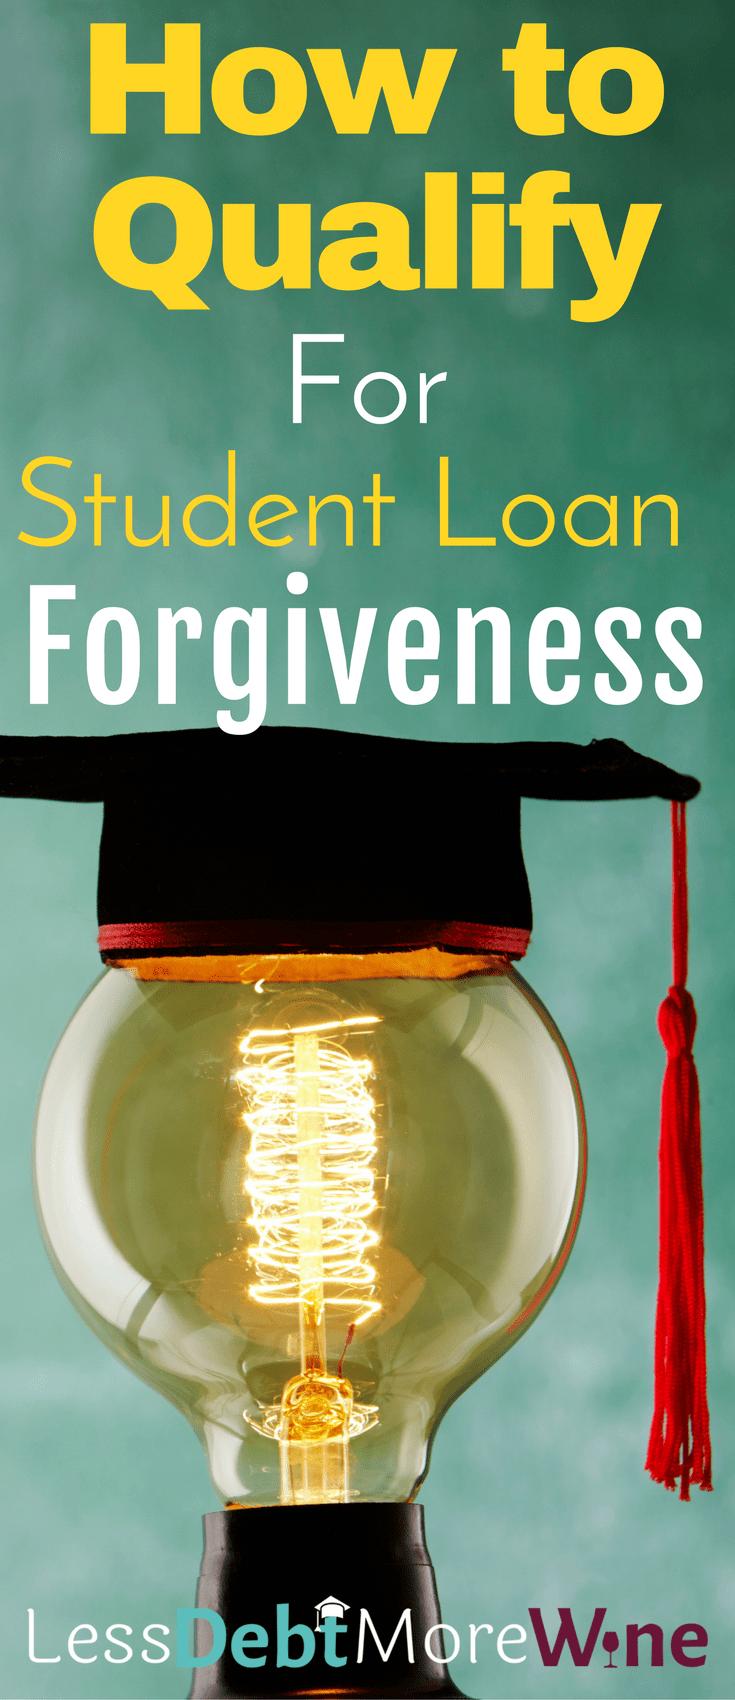 student loan debt | pay off debt | debt repayment | student debt | millennial money tips | student loan refinancing | student loan forgiveness